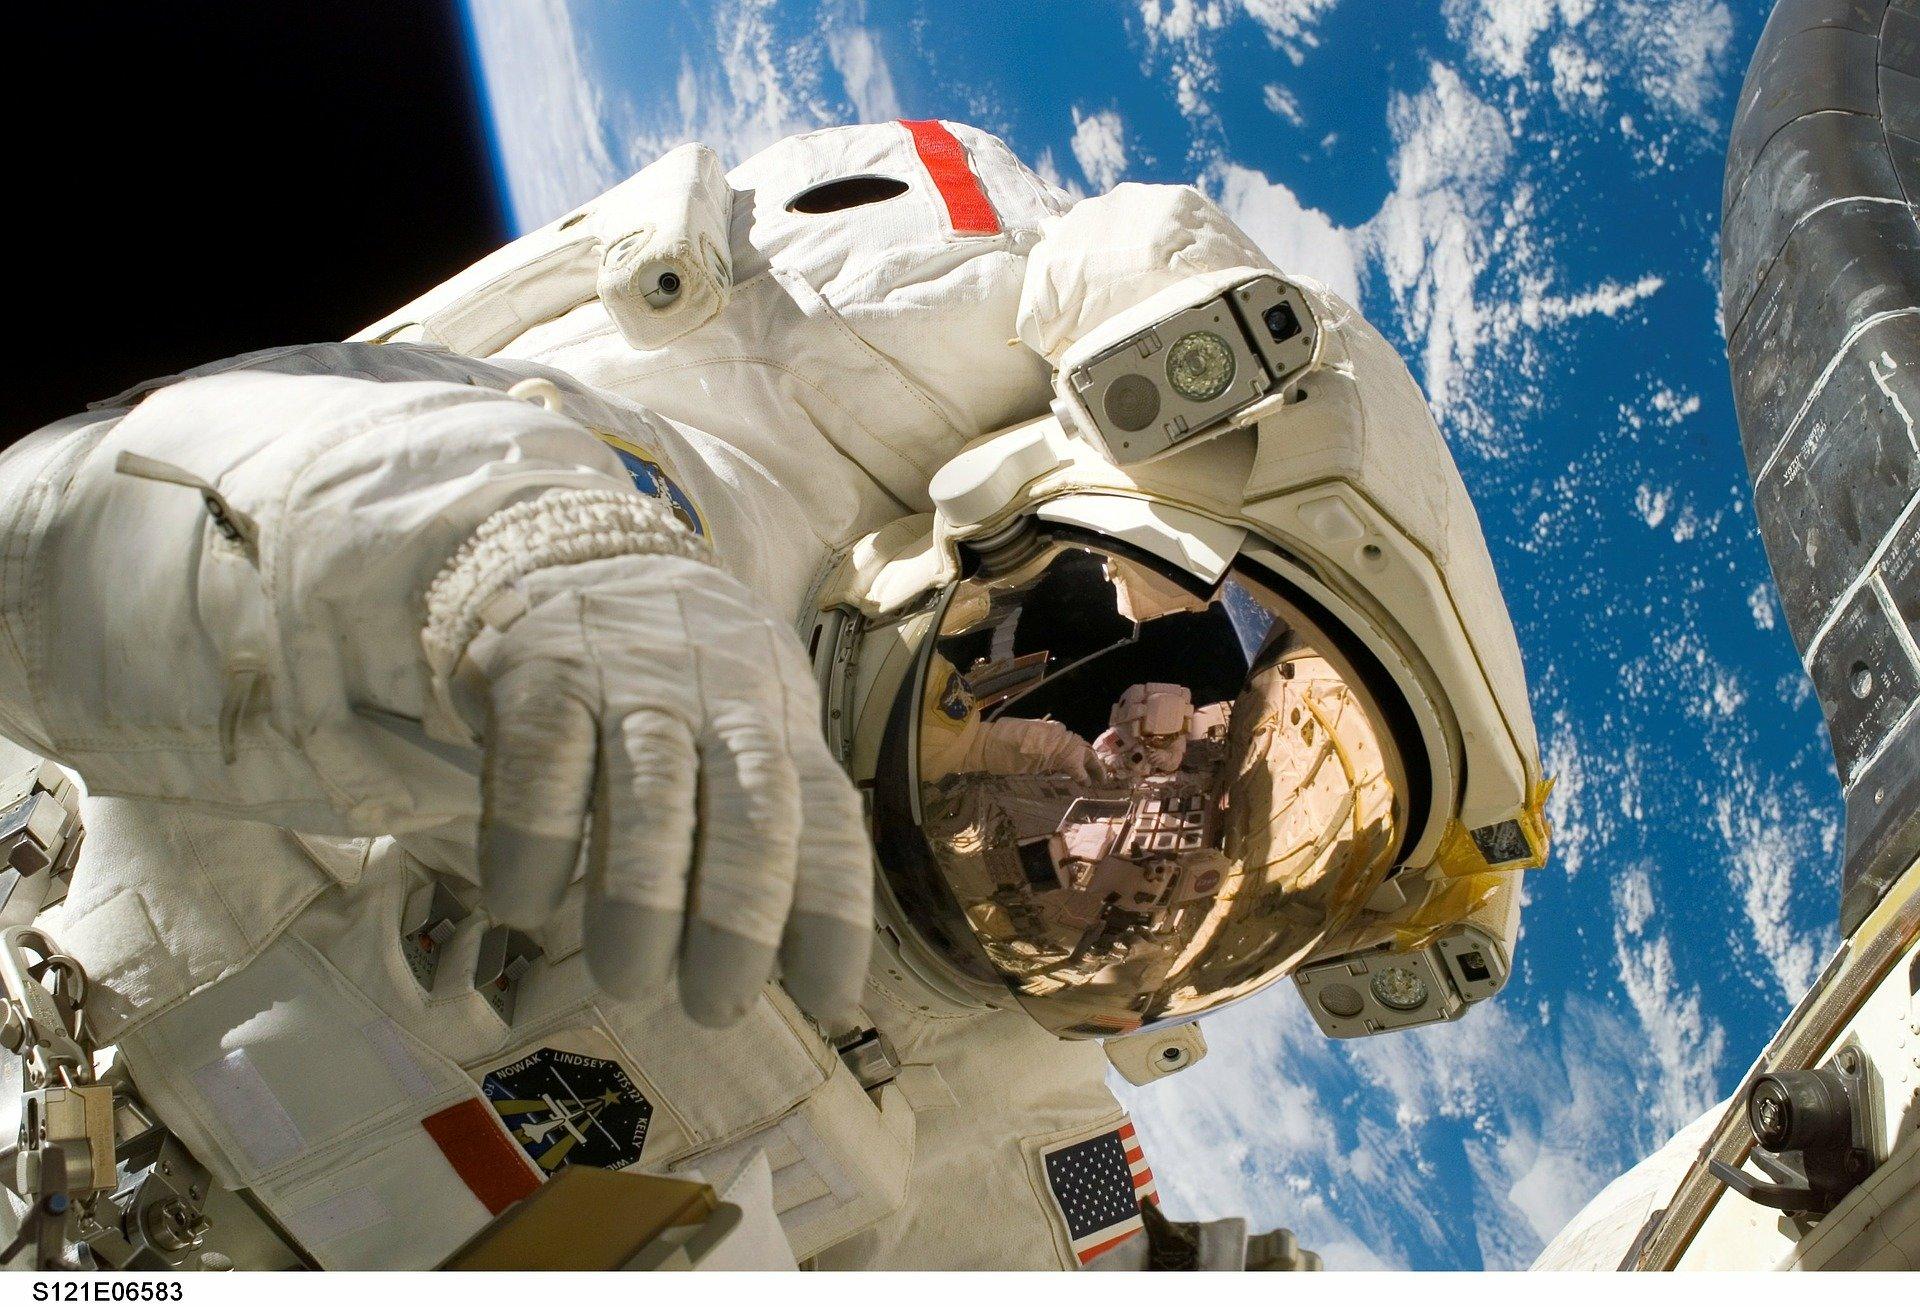 Microbiome alterations common in astronauts